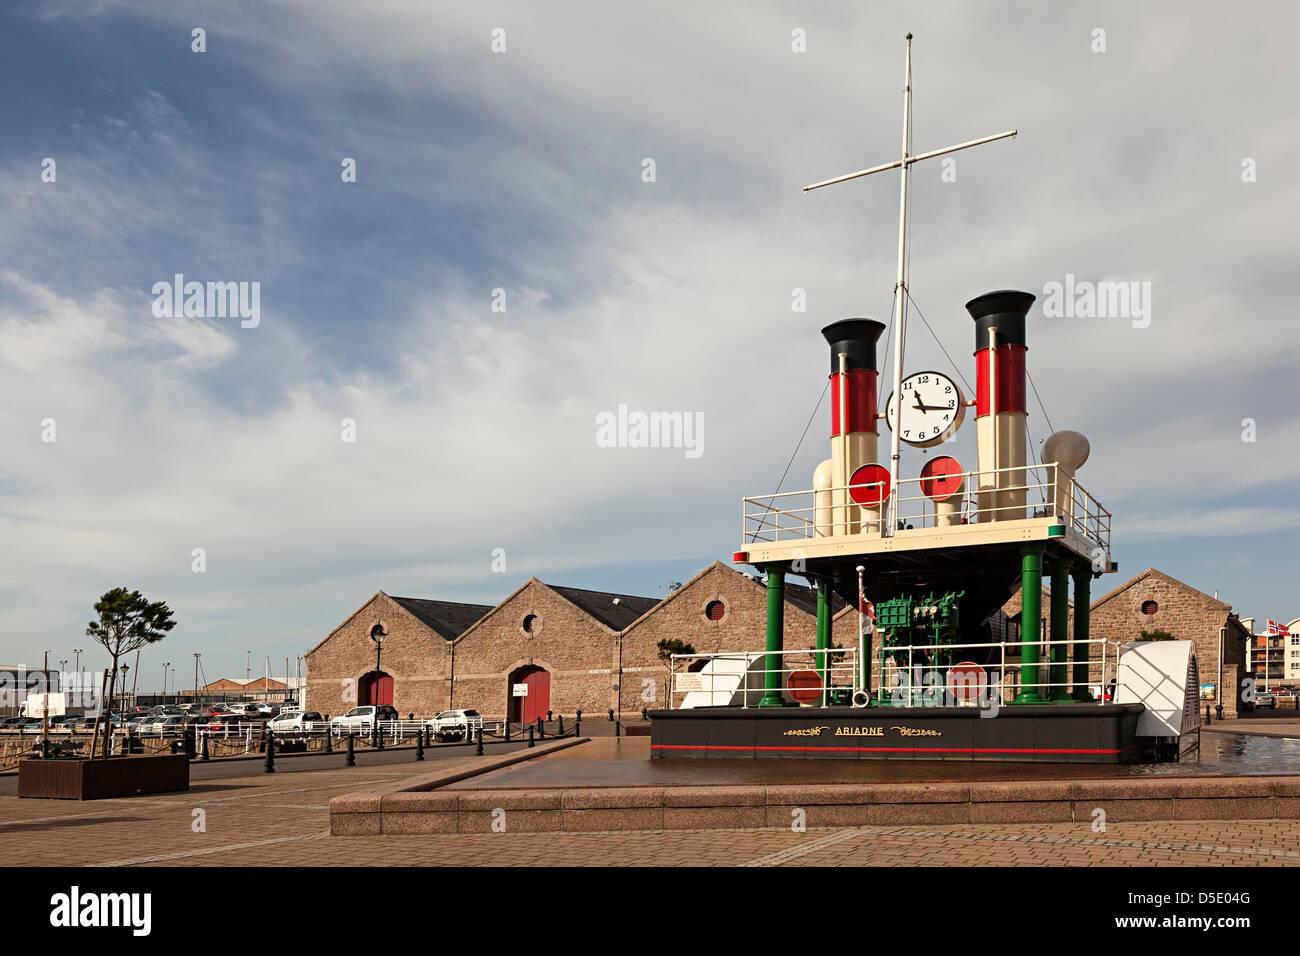 Steam powered clock teh Ariadne, St Helier, Jersey, Channel Islands, UK - Stock Image